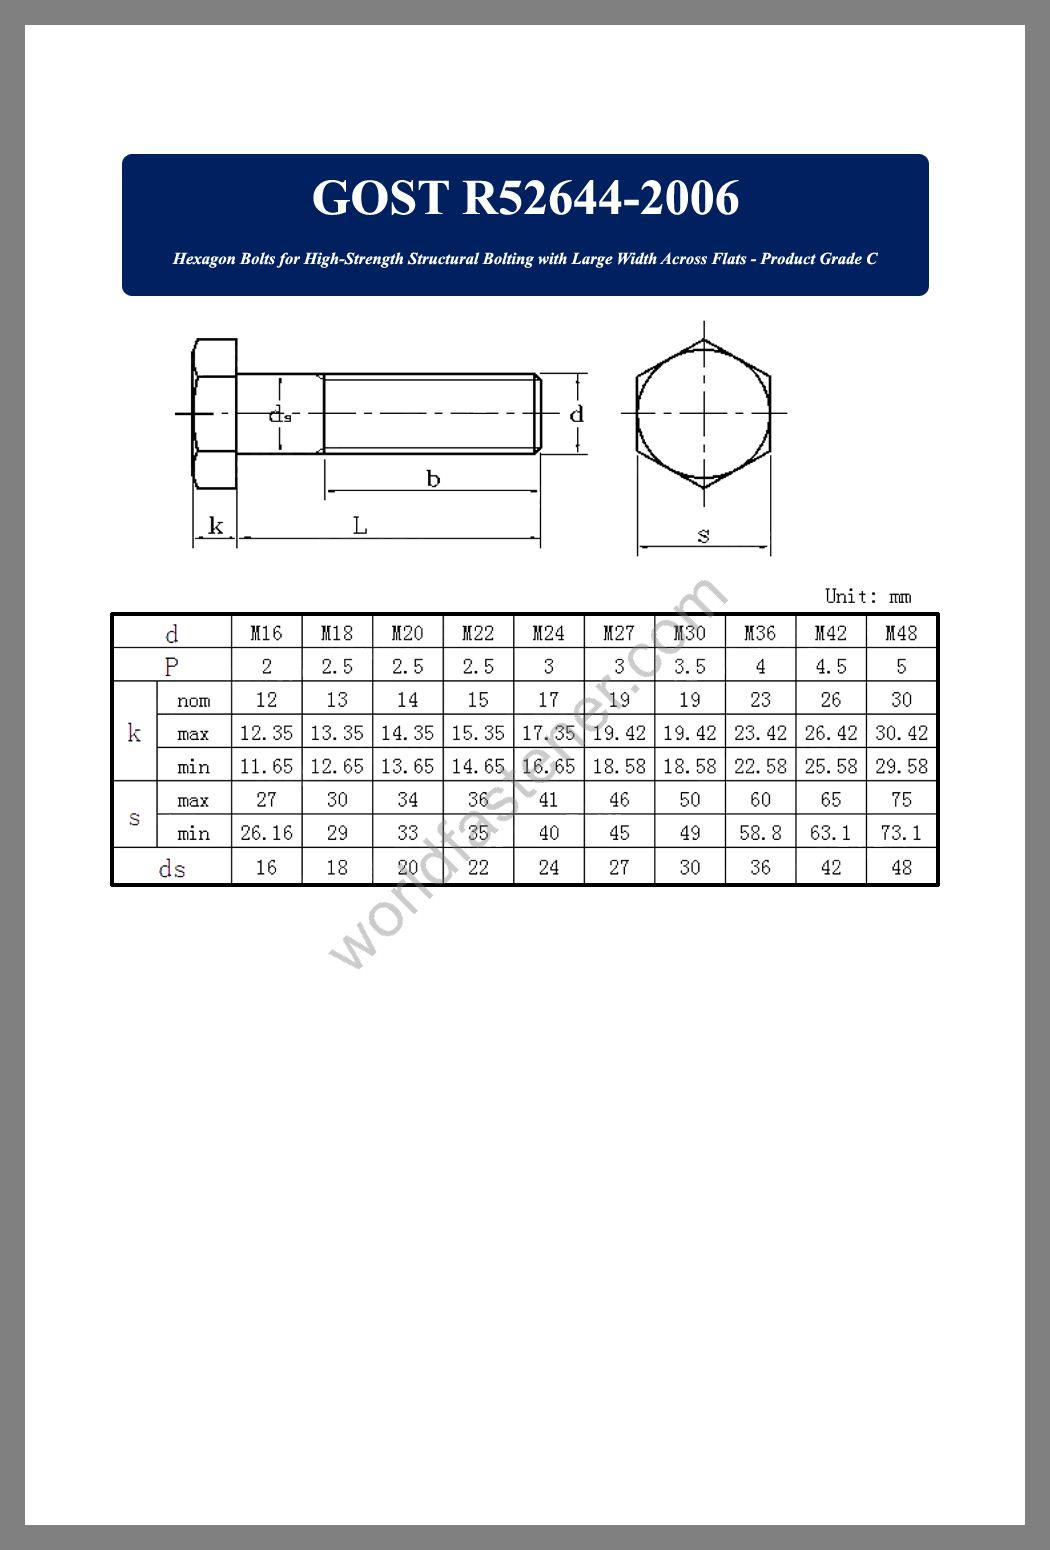 GOST R52644, GOST R52644 High-Strength Structural Bolting, fastener, screw, bolt, GOST bolt